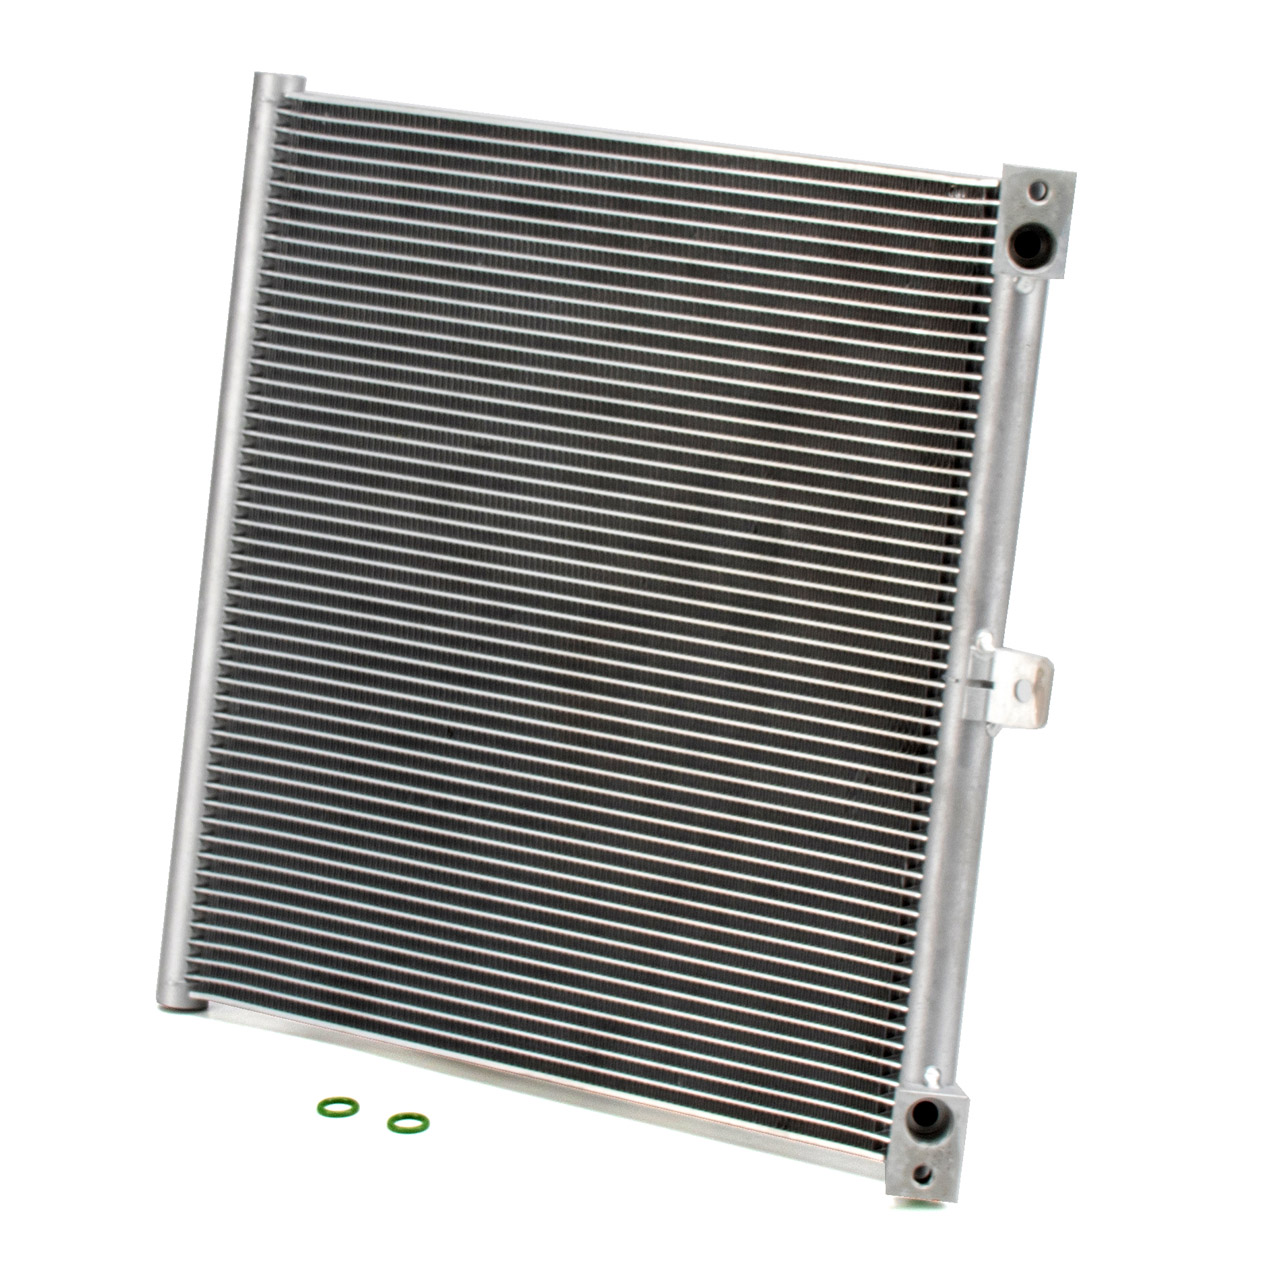 NRF 350203 Klimakondensator EASY FIT PORSCHE 911 991 Boxster 981 Cayman 981 99157311102